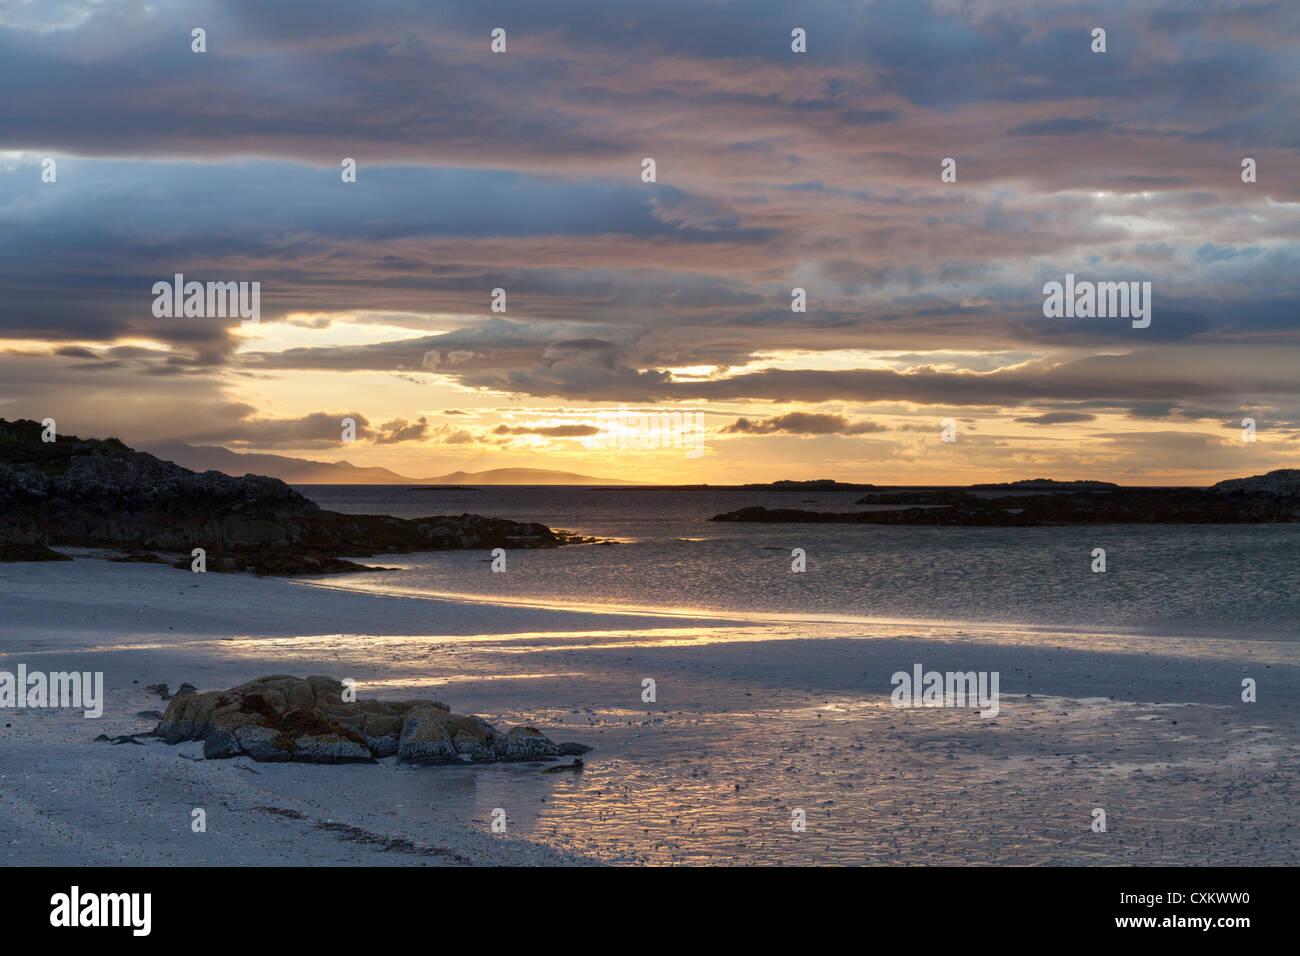 Traigh Bay, Arisaig, Beach sunset, West coast of Scotland, UK - Stock Image